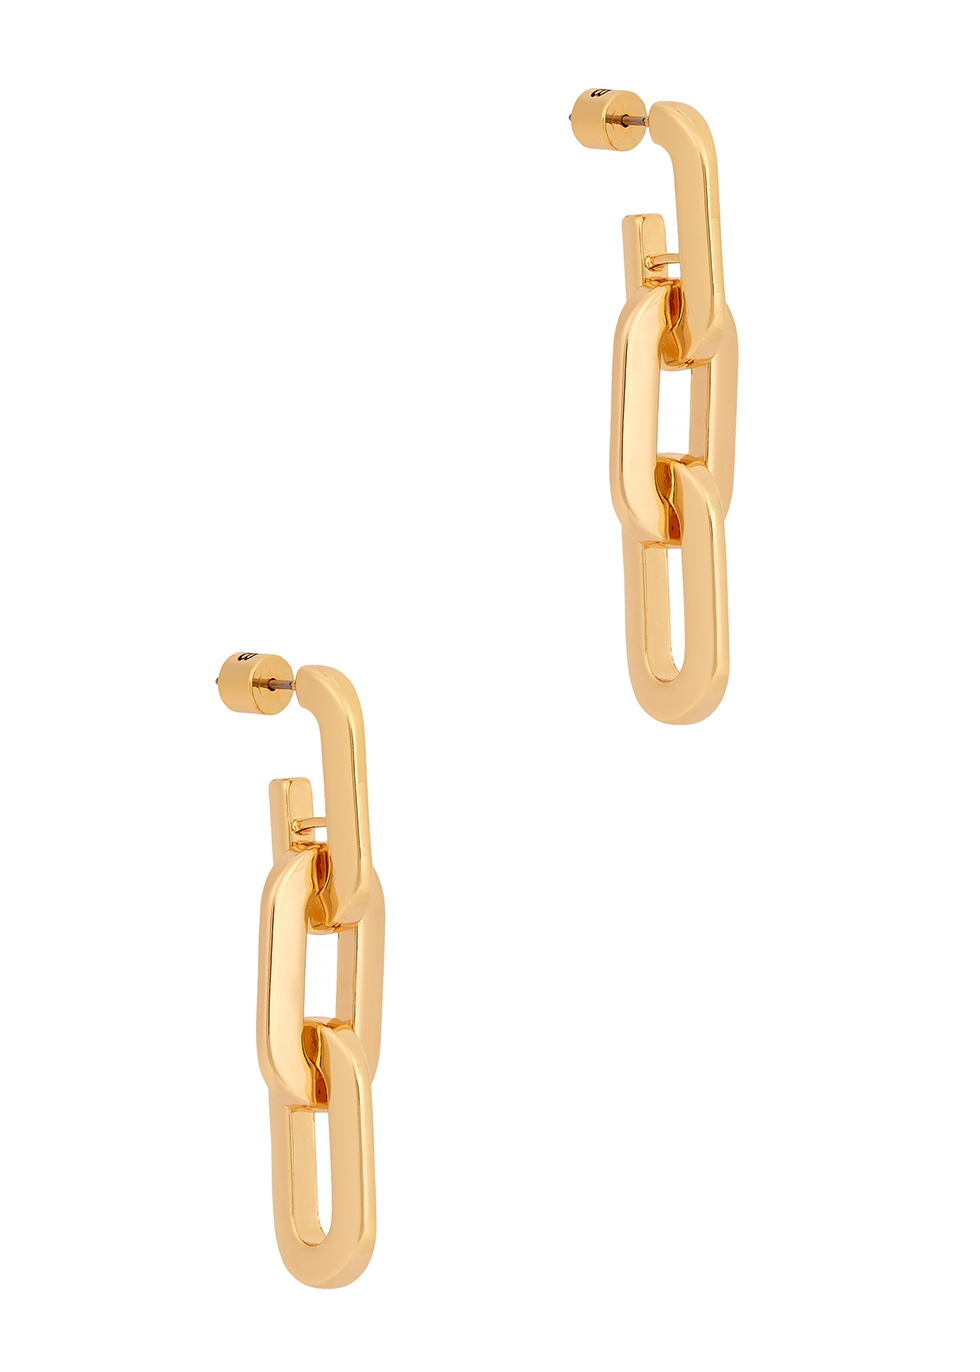 Toni Link 14kt gold-dipped drop earrings